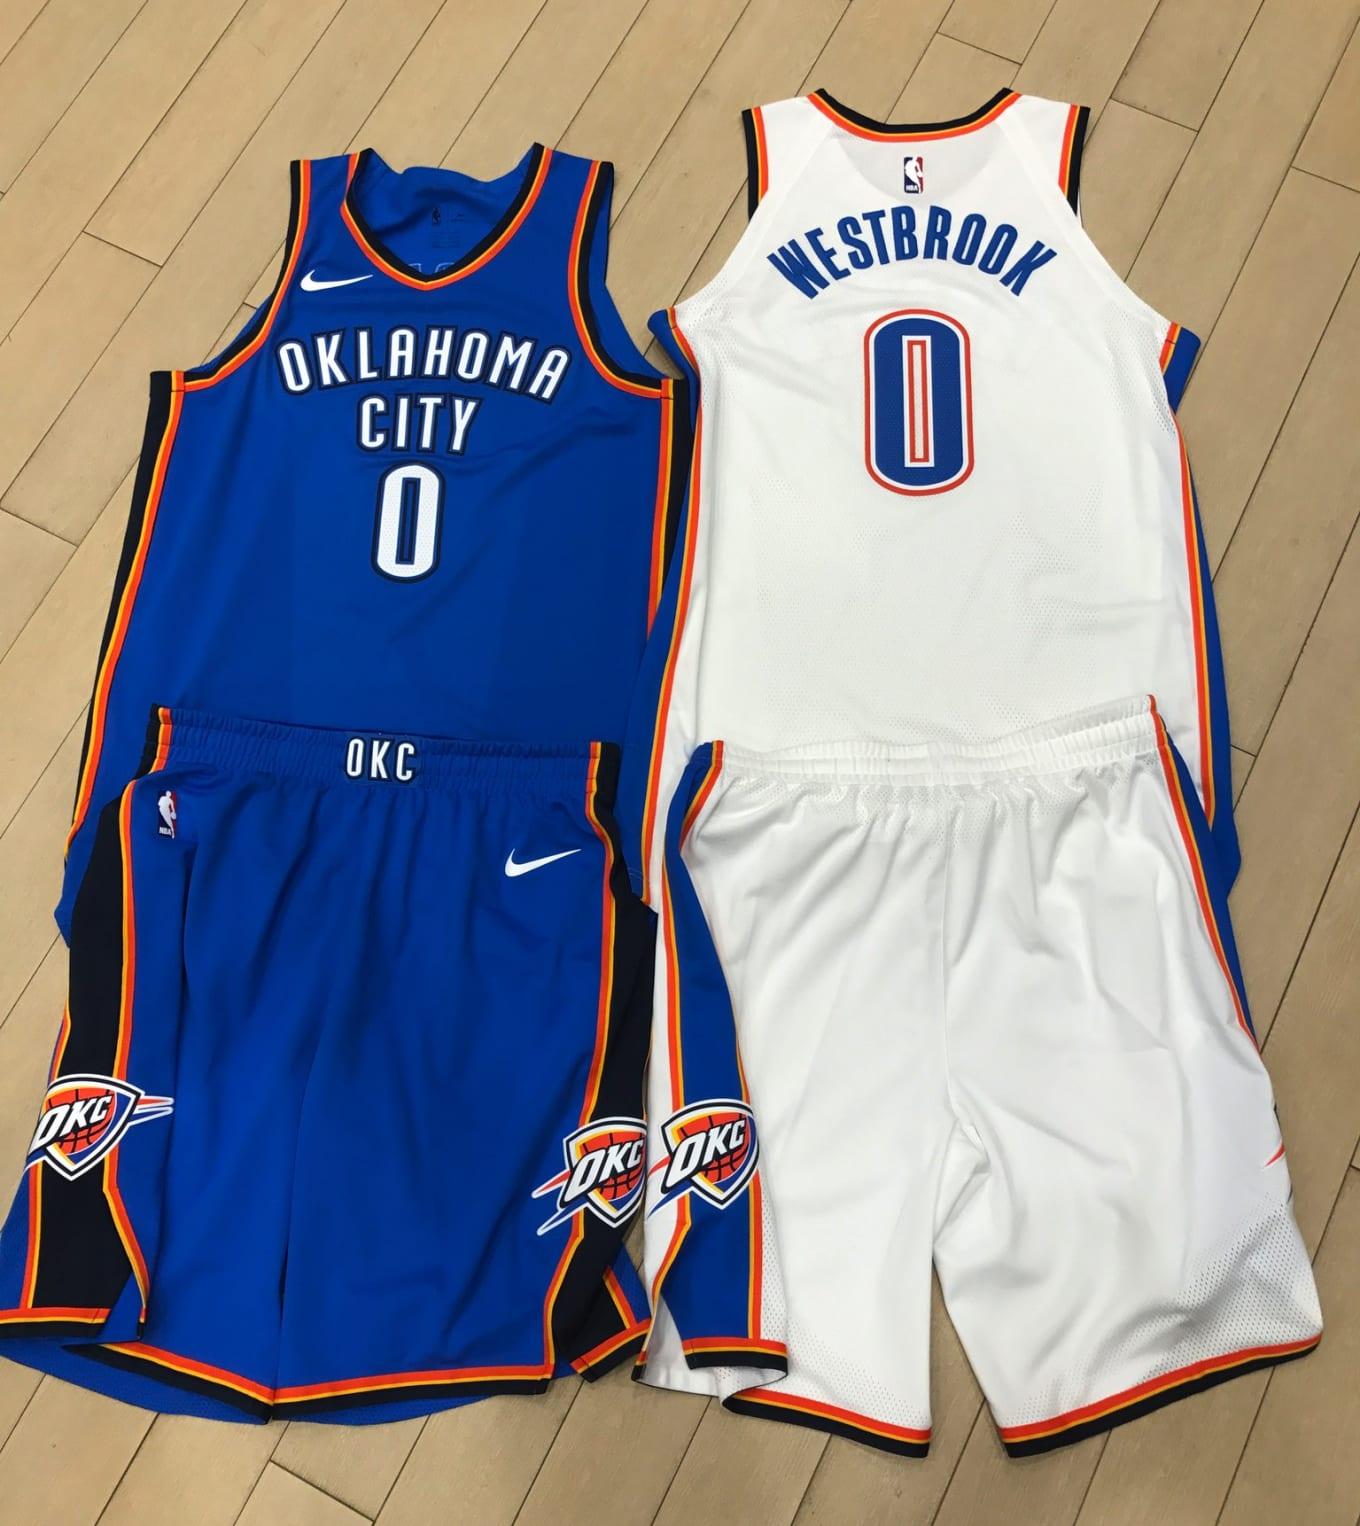 Every 2017 Nike NBA Jersey So Far | Sole Collector